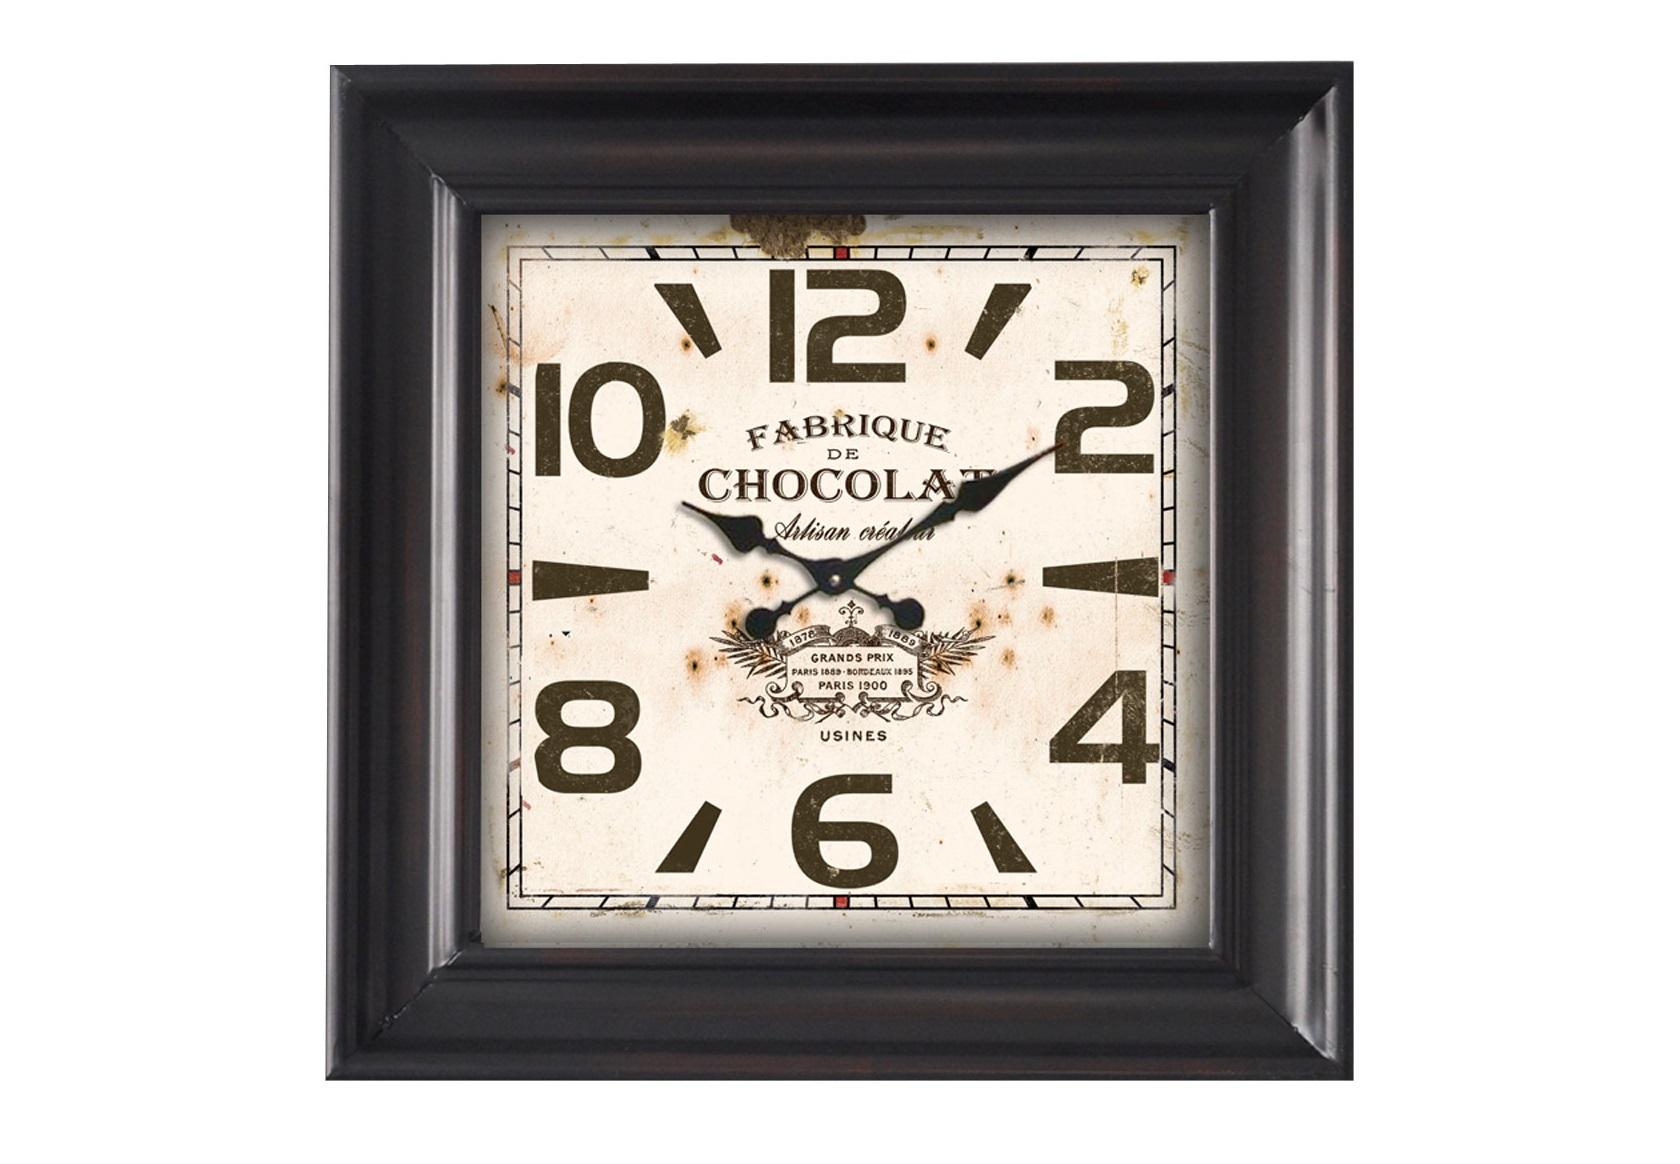 Настенные часы ChocolatНастенные часы<br>Батарейки типа AА.<br><br>Material: Железо<br>Length см: None<br>Width см: 47<br>Depth см: 9<br>Height см: 47